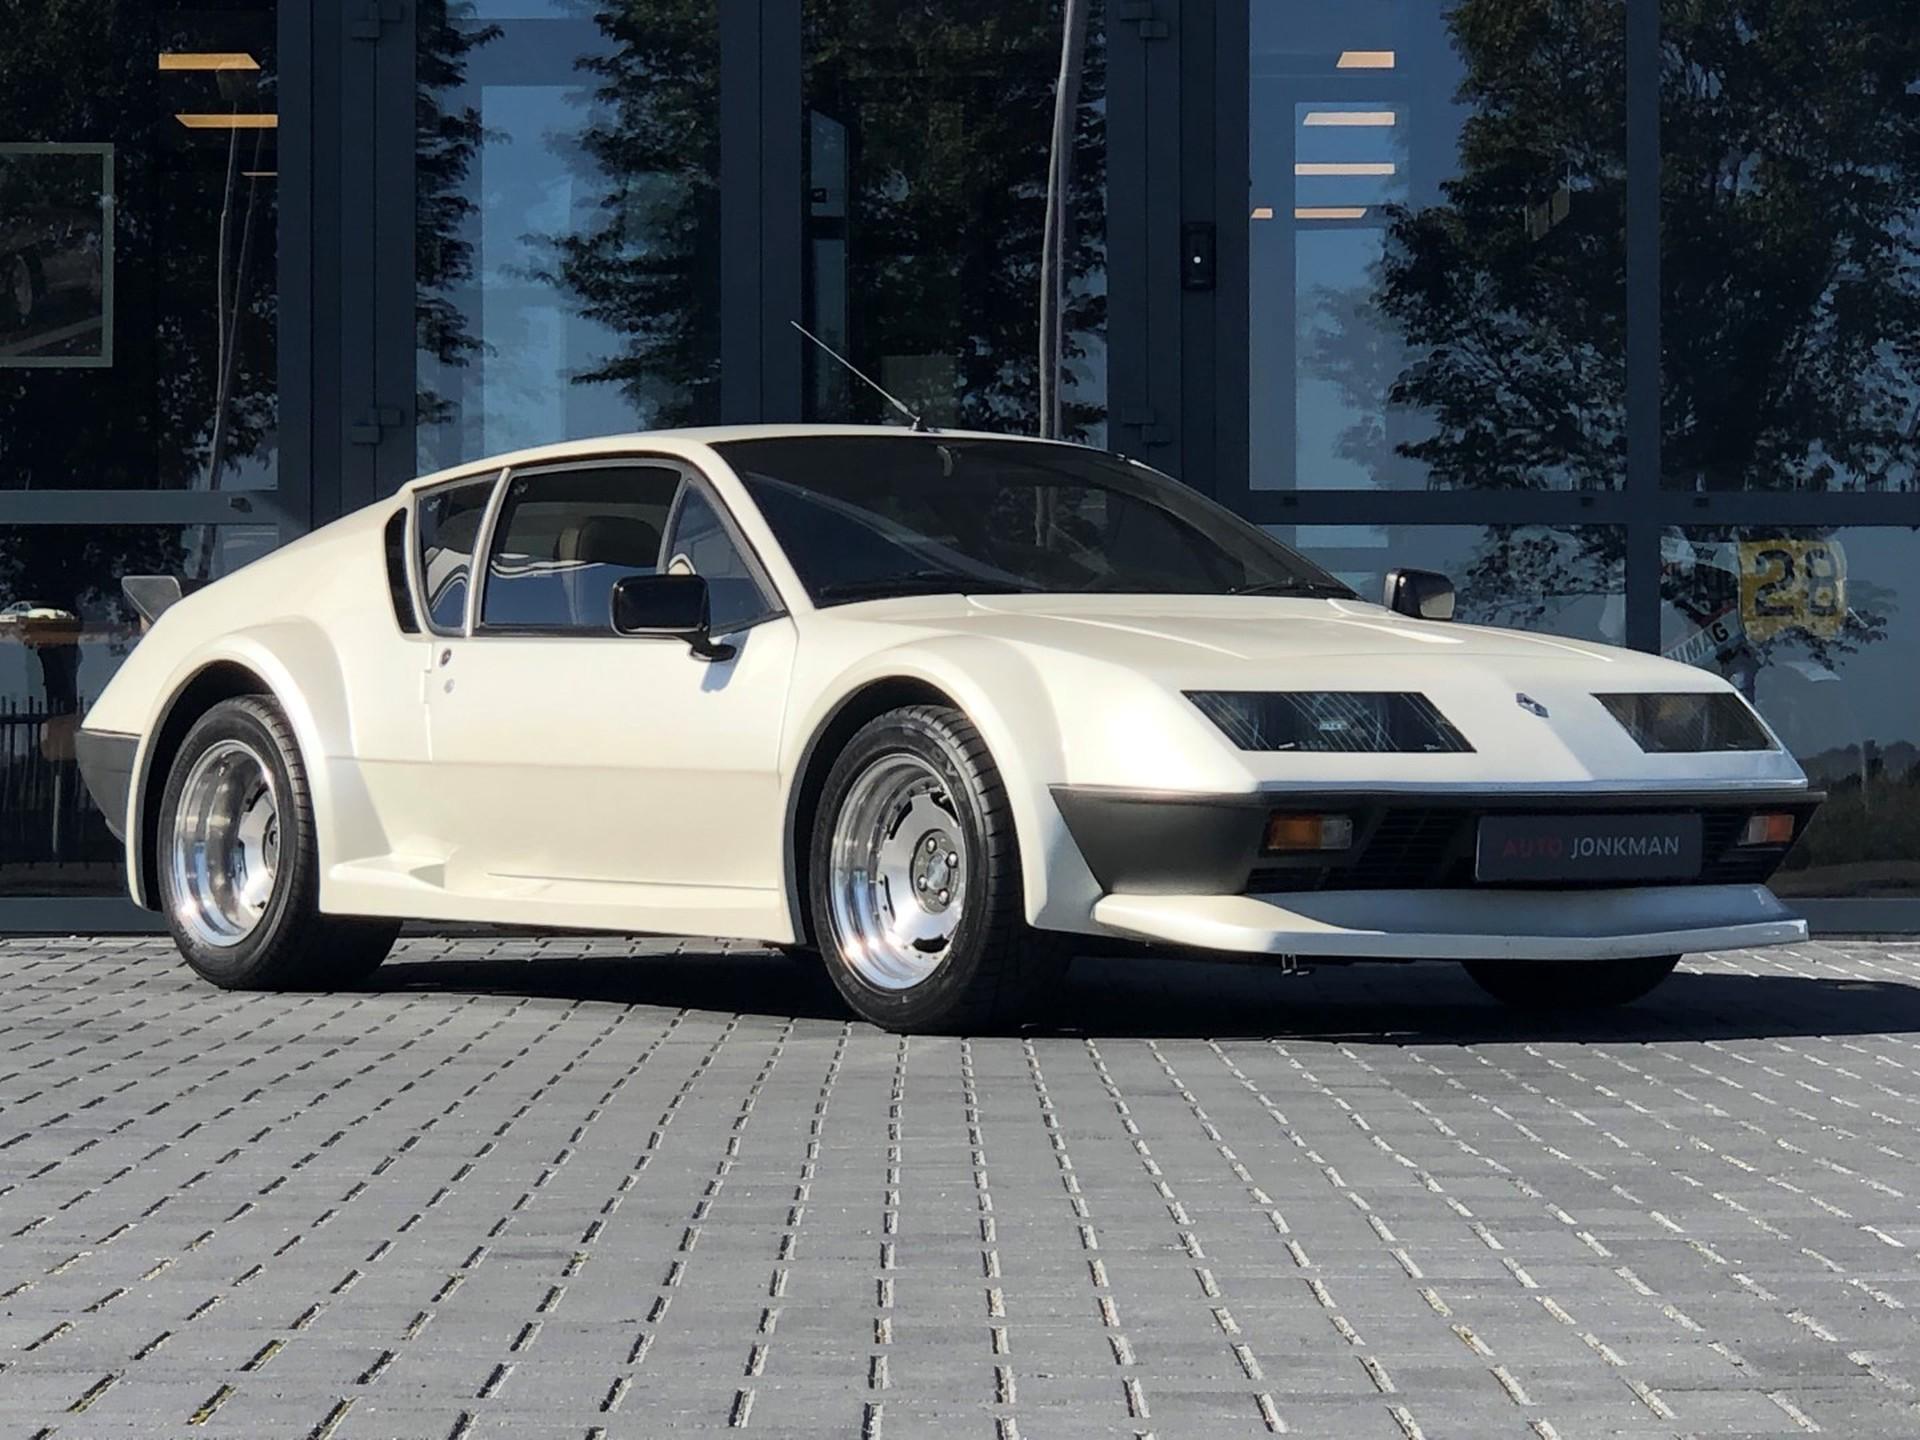 Renault-Alpine originele Pack GT (S)-2.7 V6 A 310-Auto Jonkman